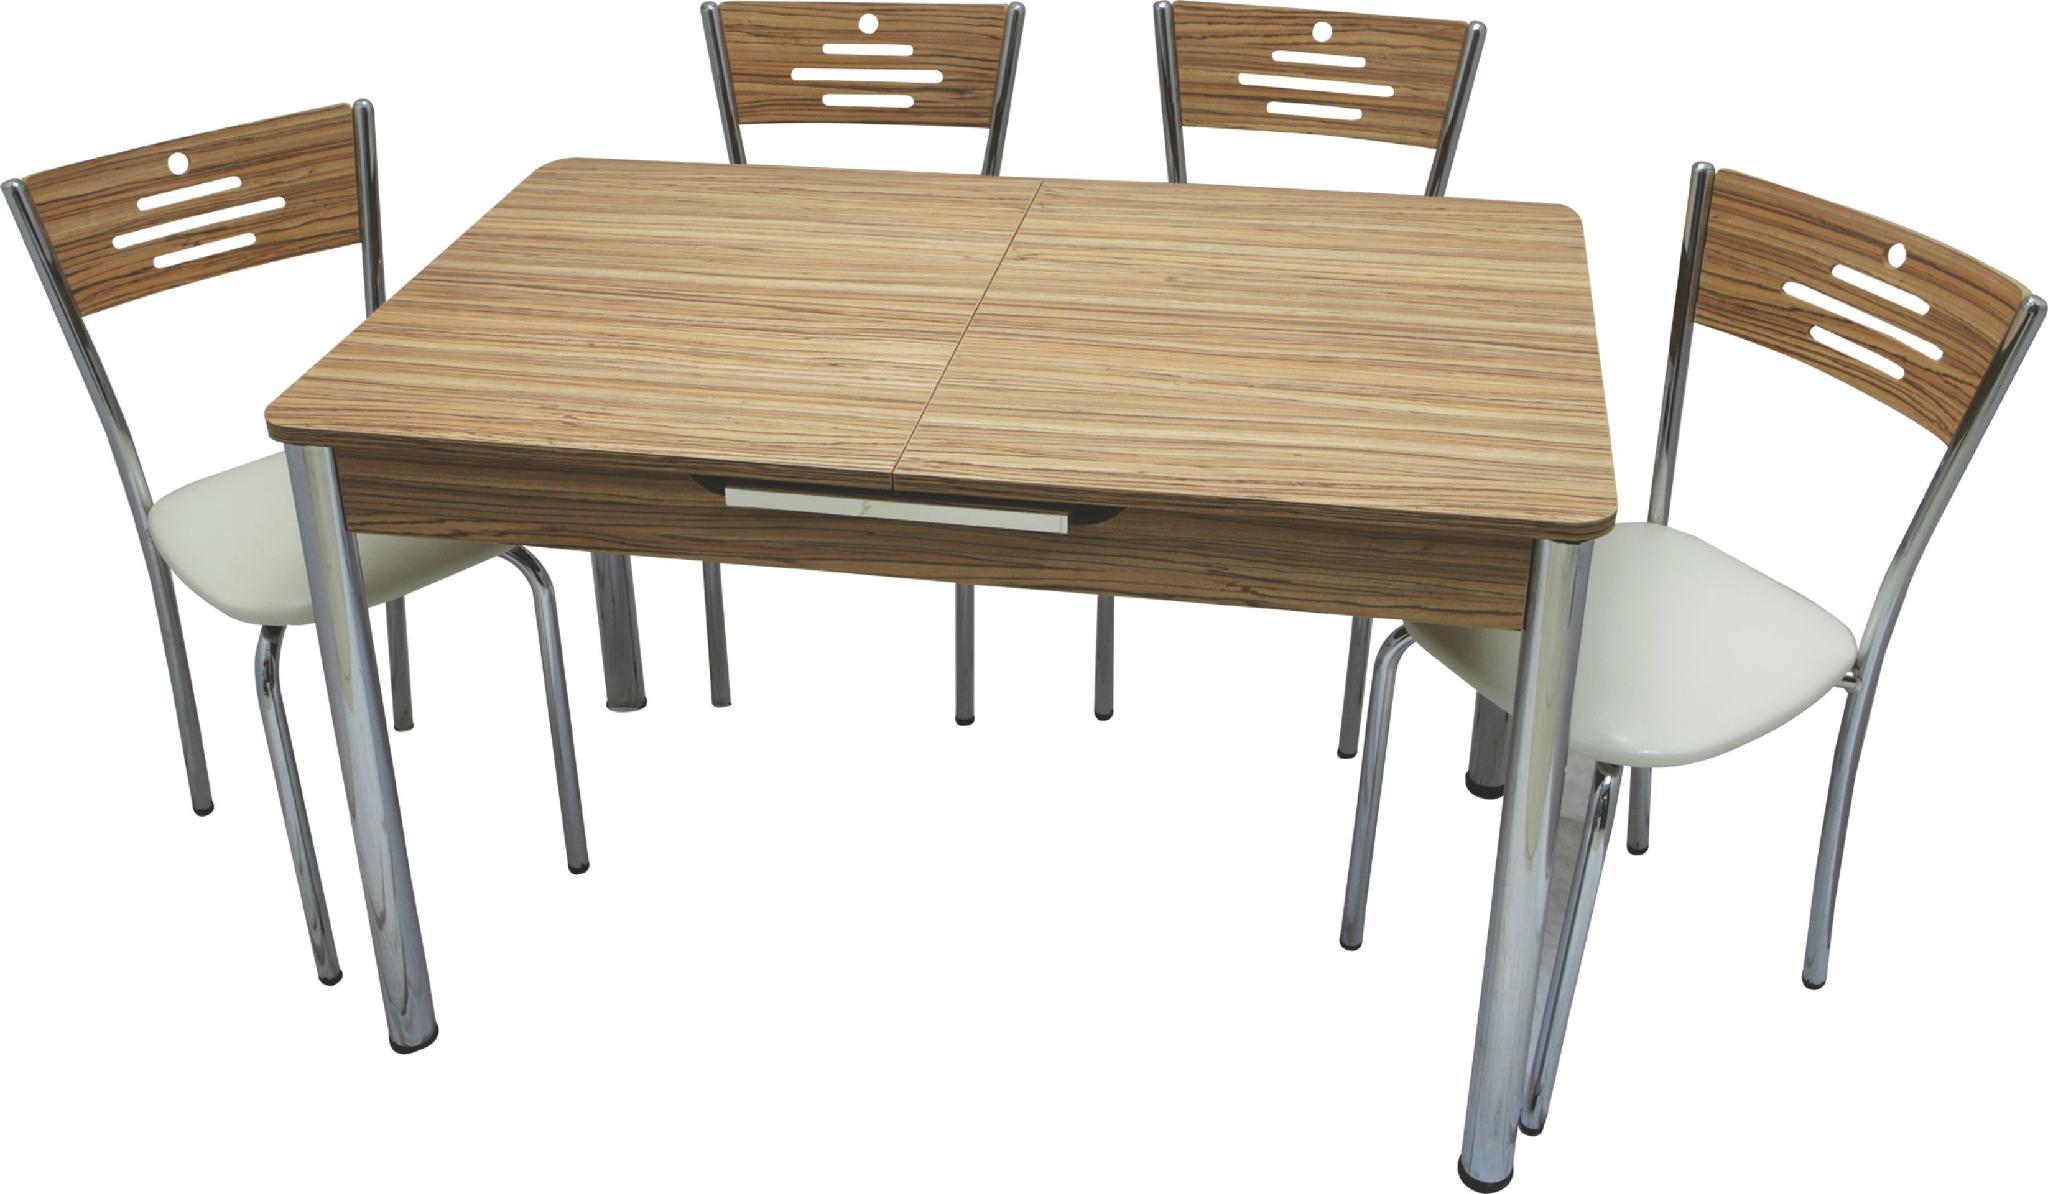 BAF 4025 TABLE - BAF 372 CHAIR 3